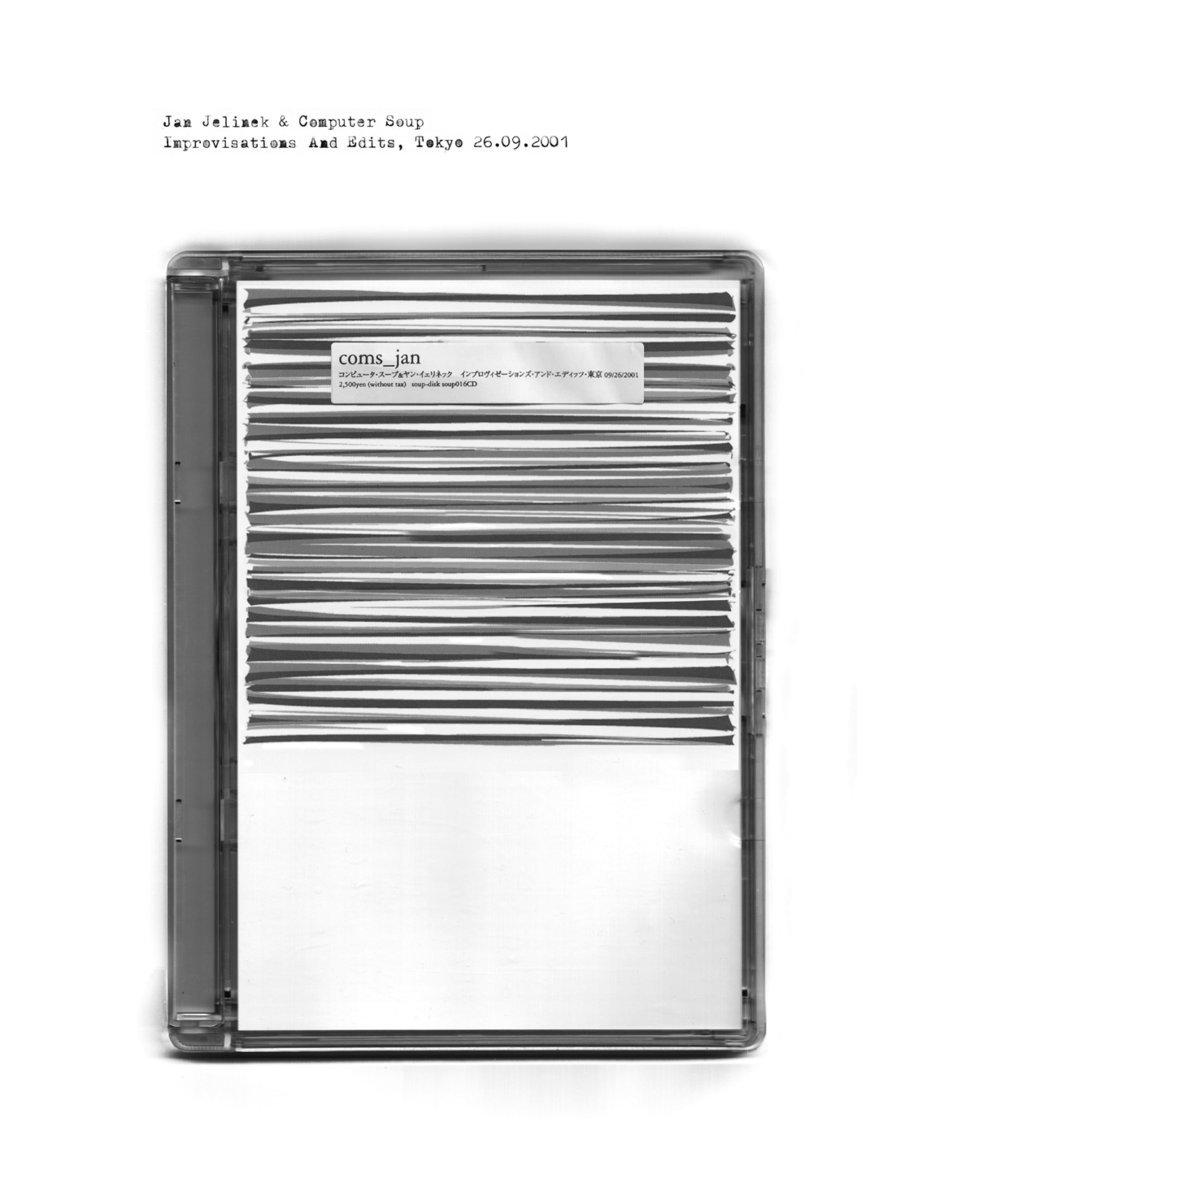 Jan Jelinek & Computer Soup『Improvisations And Edits, Tokyo 26.09.2001』【音楽レコード/音響ジャズ/グリッジ/ミニマル】